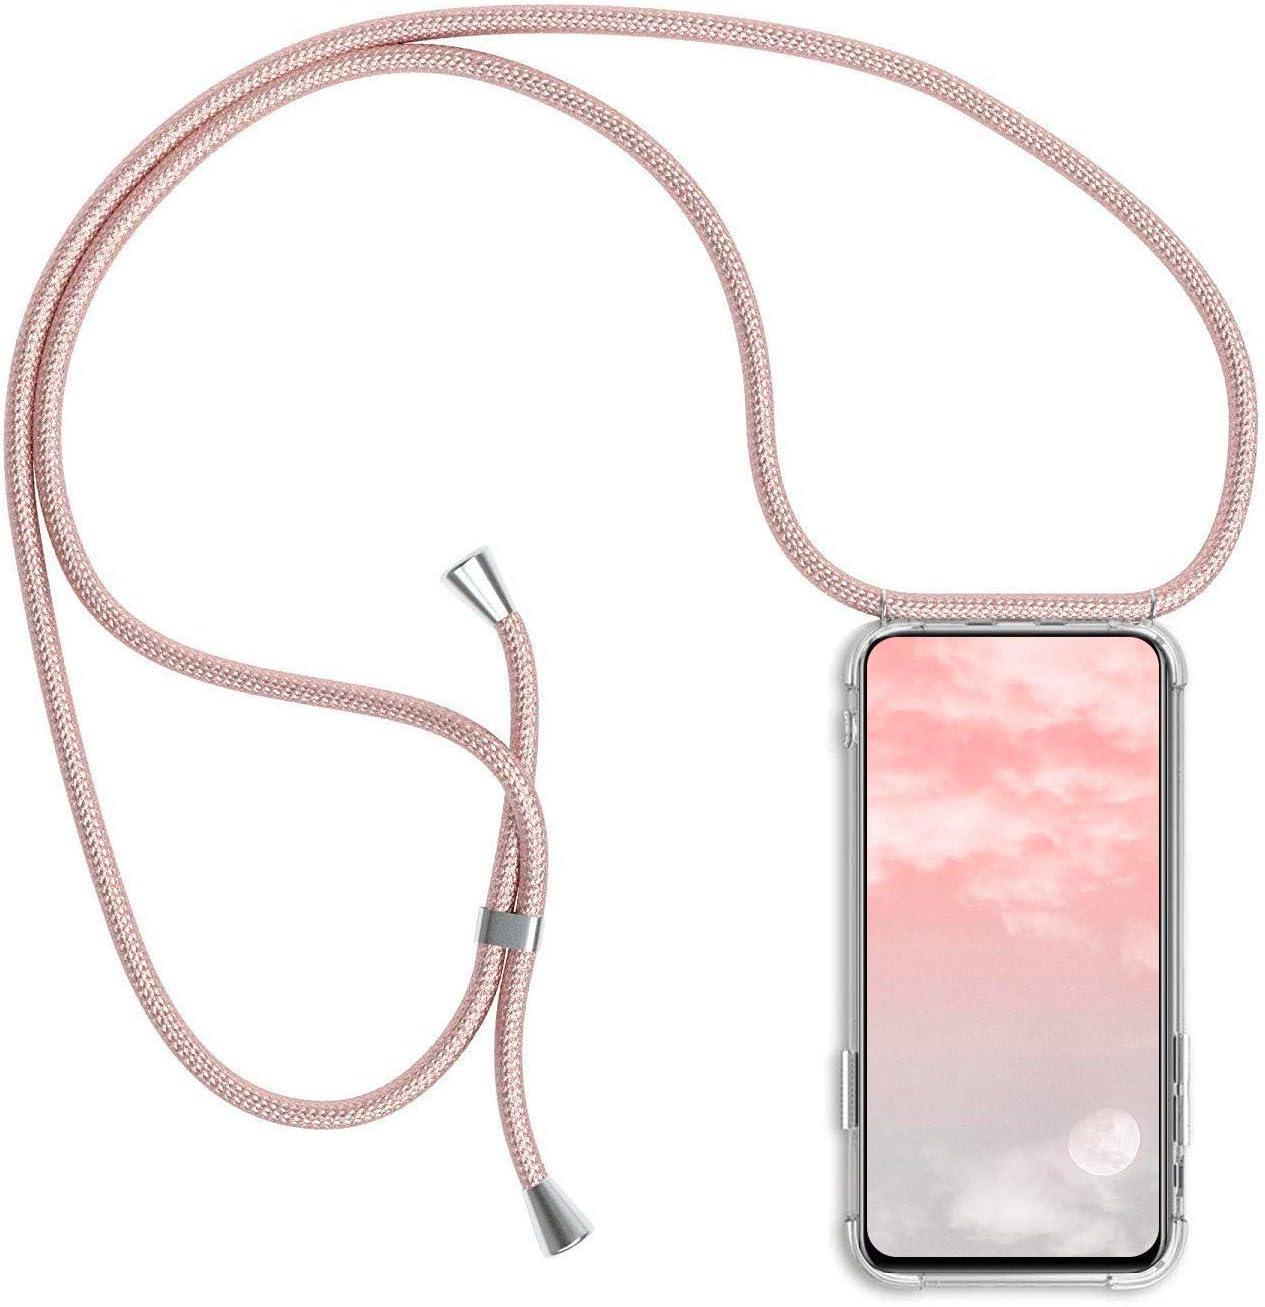 Surakey Silikon H/ülle f/ür Huawei P30 Lite Handykette H/ülle mit Umh/ängeband,Transparent TPU Silikon Handyh/ülle Schutzh/ülle mit Kordel zum Umh/ängen Necklace H/ülle f/ür Huawei P30 Lite,Rose Gold